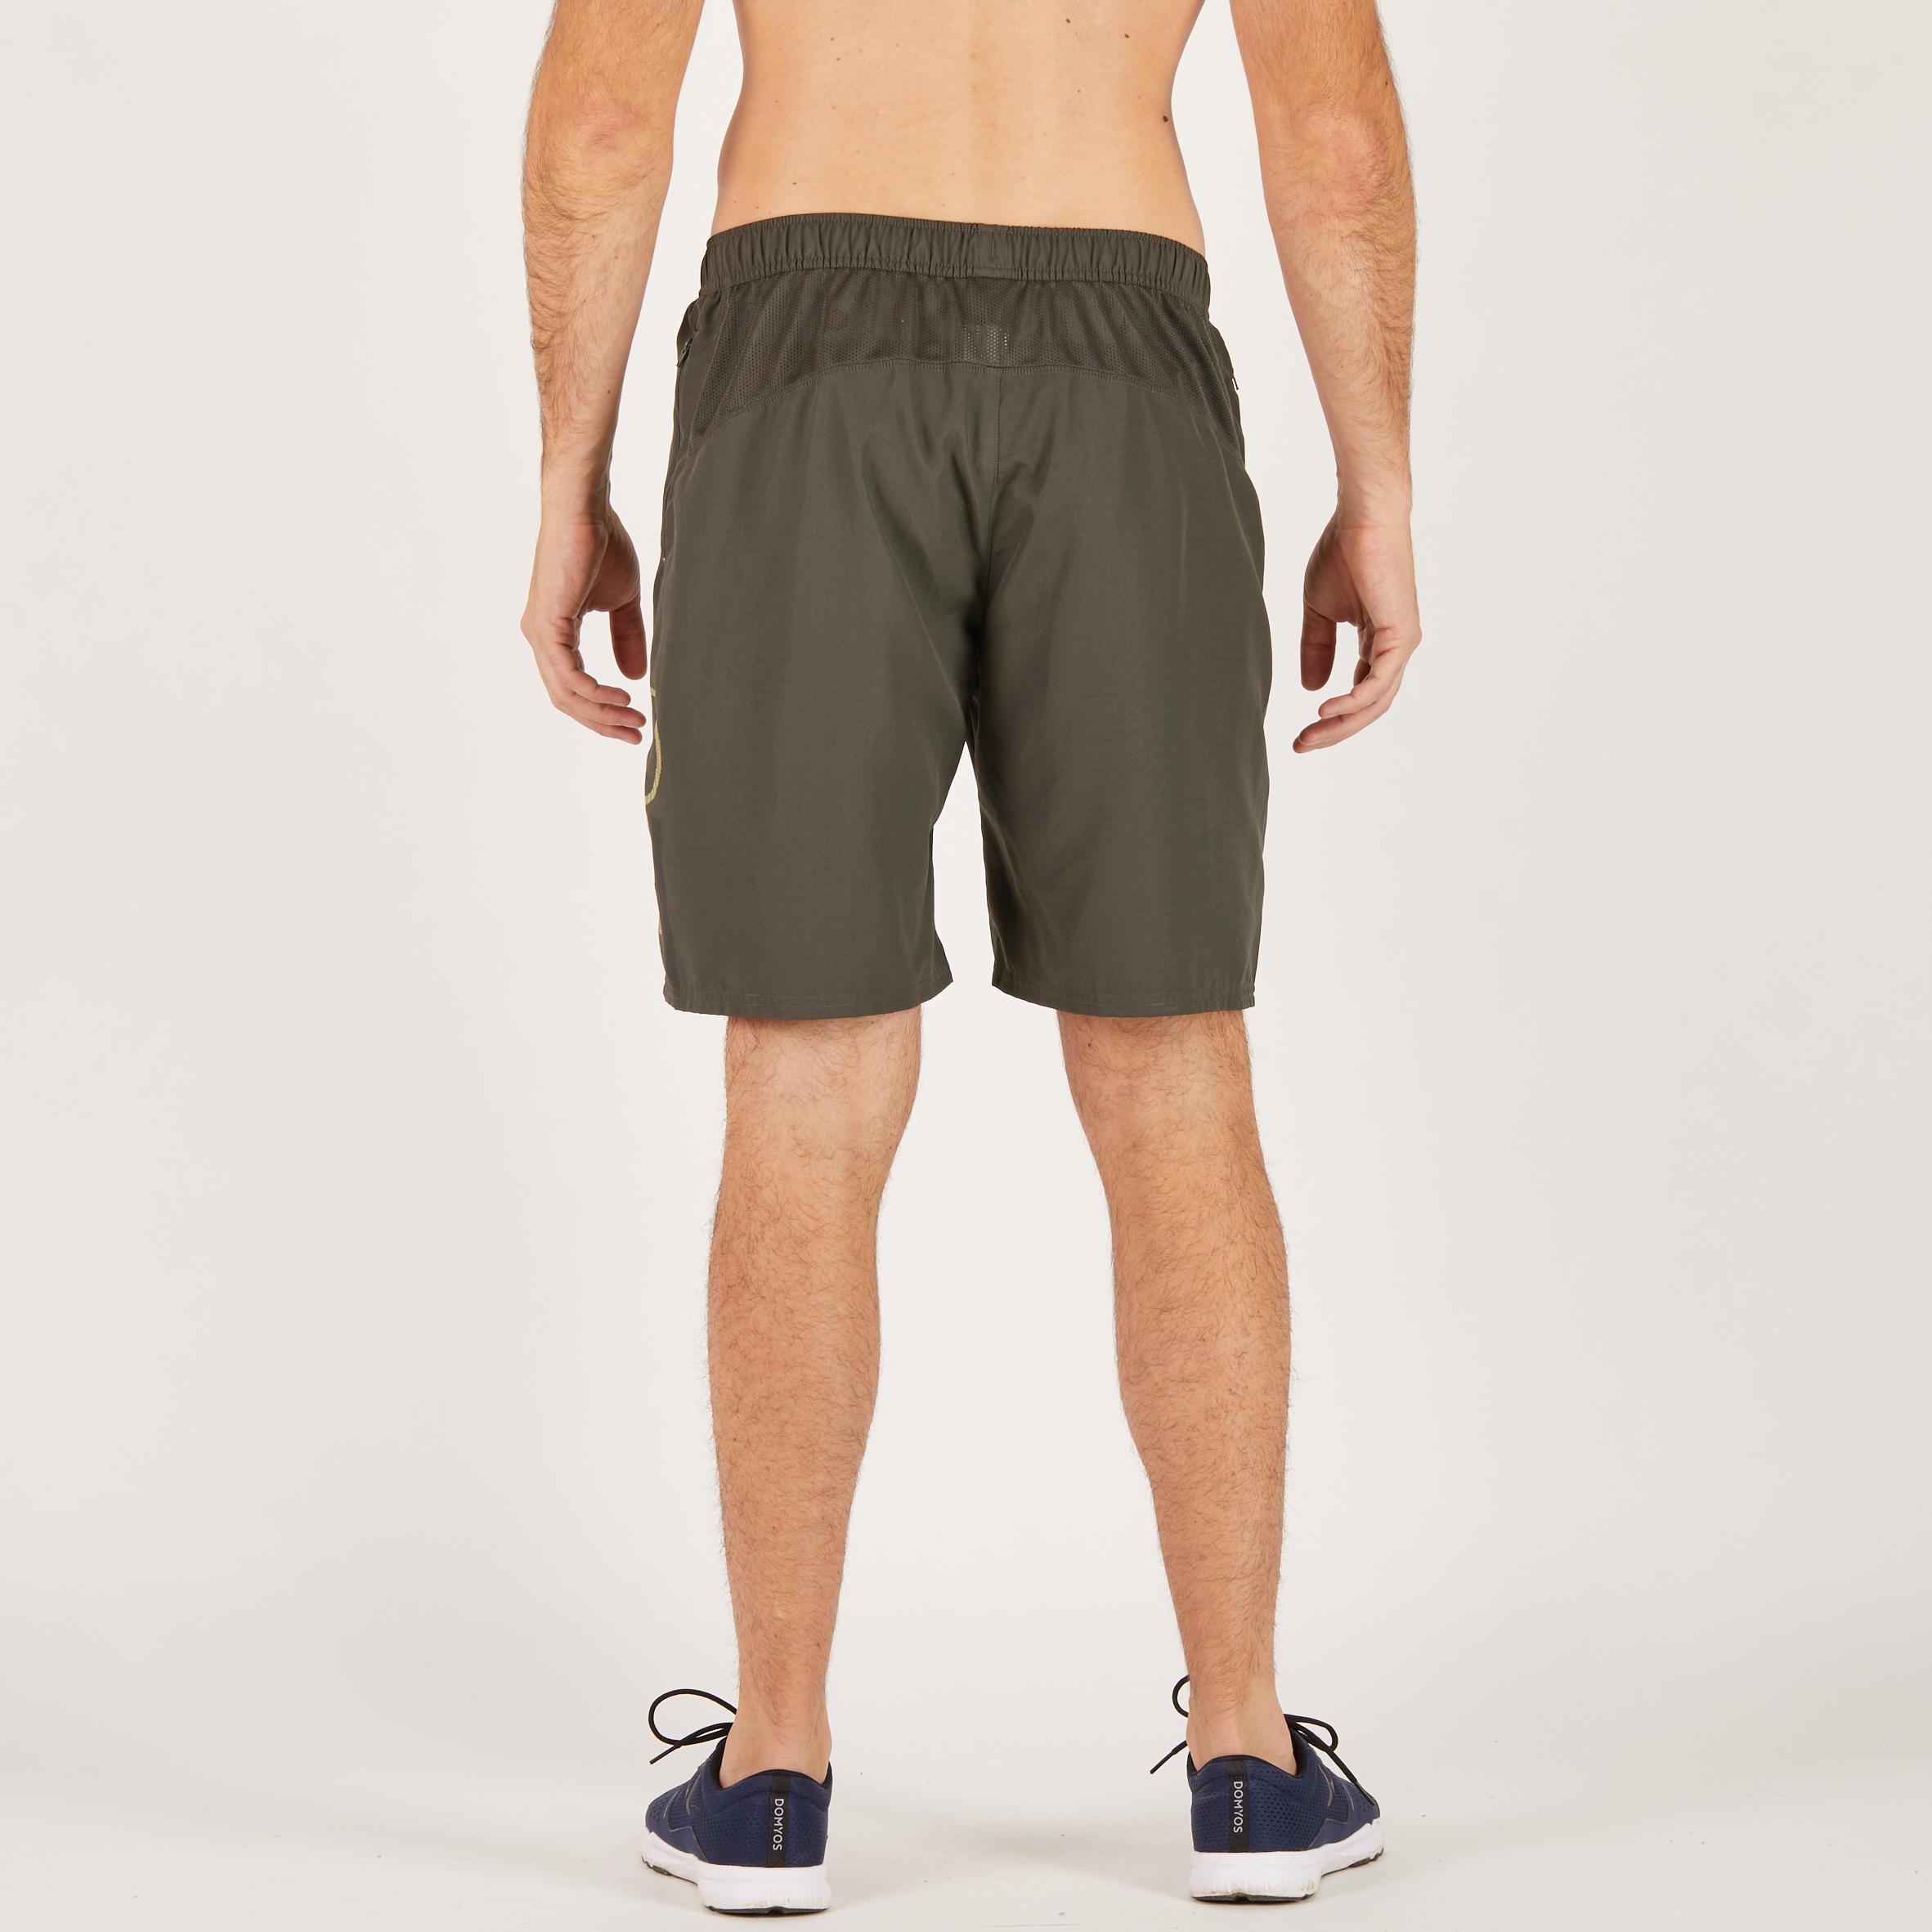 FST120 Fitness Cardio Shorts - Khaki